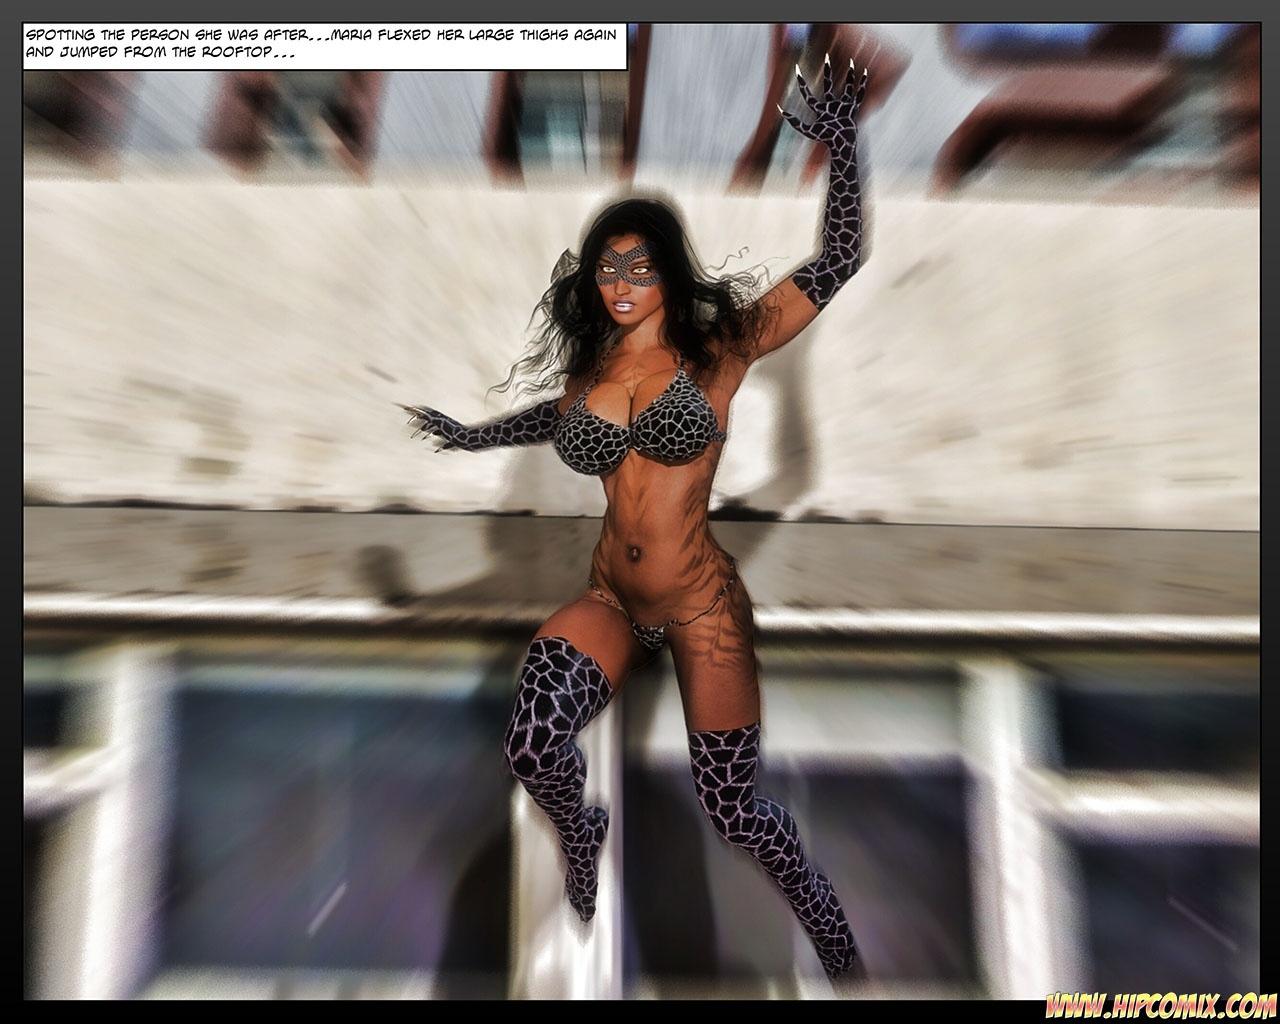 Panther-Girl-21 7 free sex comic